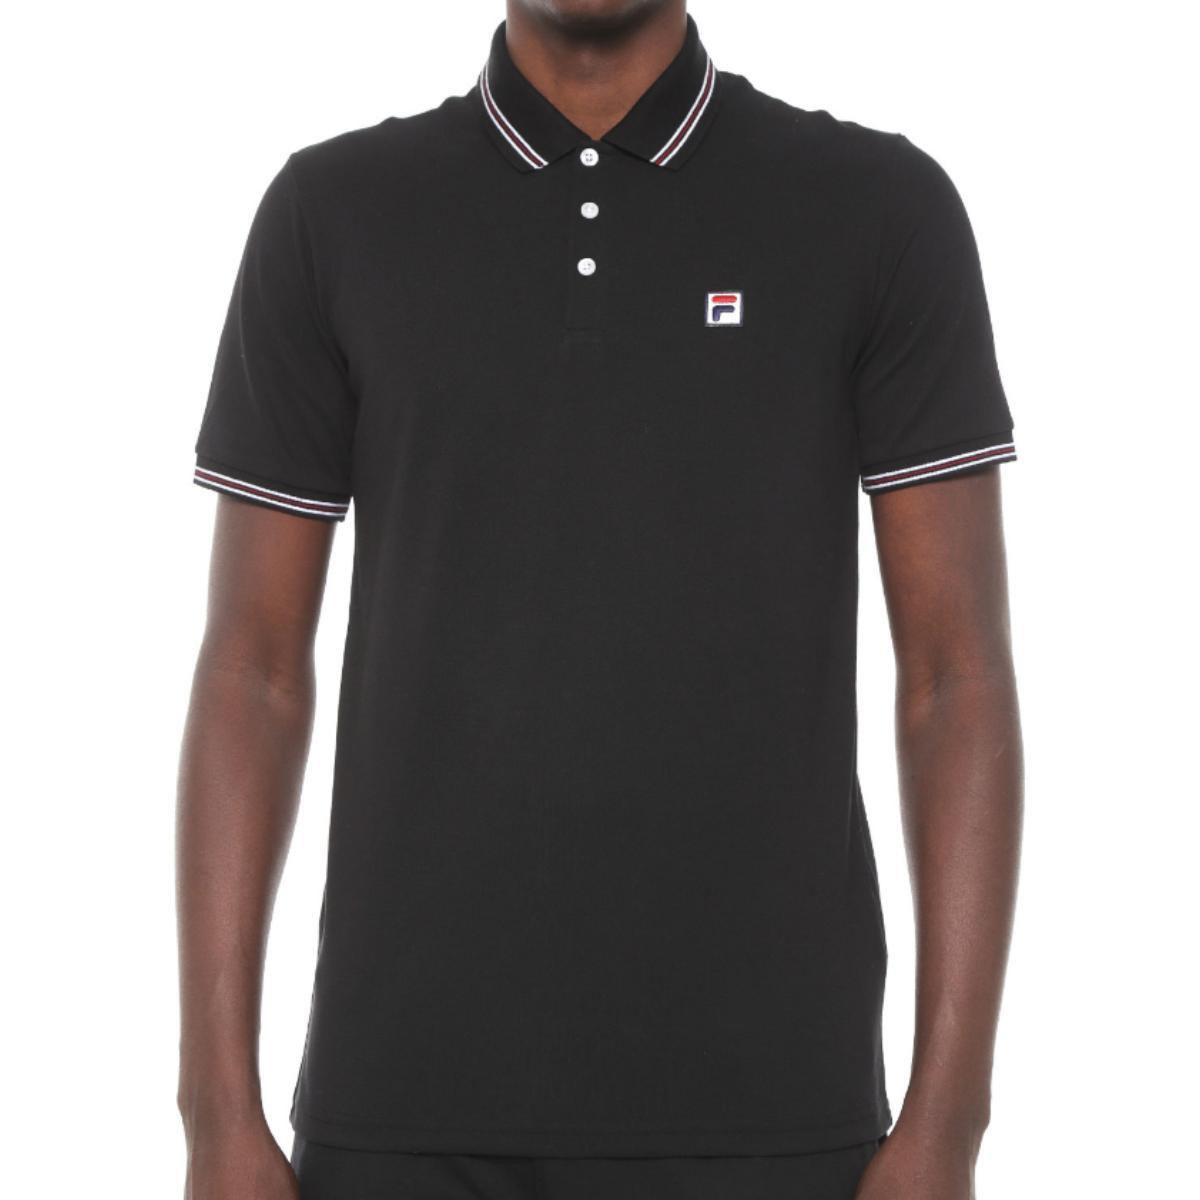 Camiseta Masculina Fila Ls360191.160  Premium Pima Preto